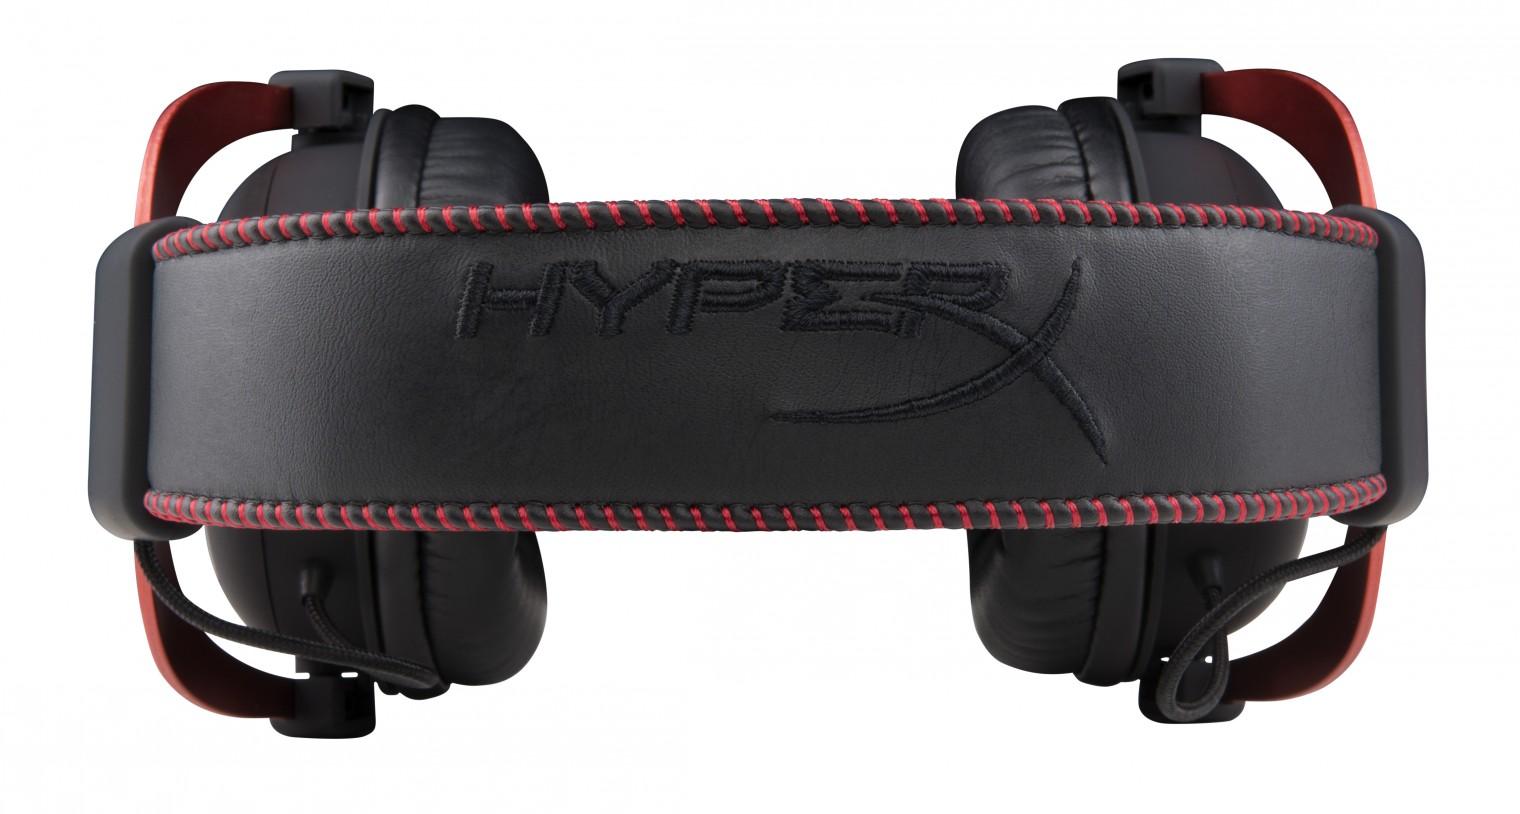 Slúchadlá s mikrofónom Herné slúchadlá Kingston HyperX Cloud II